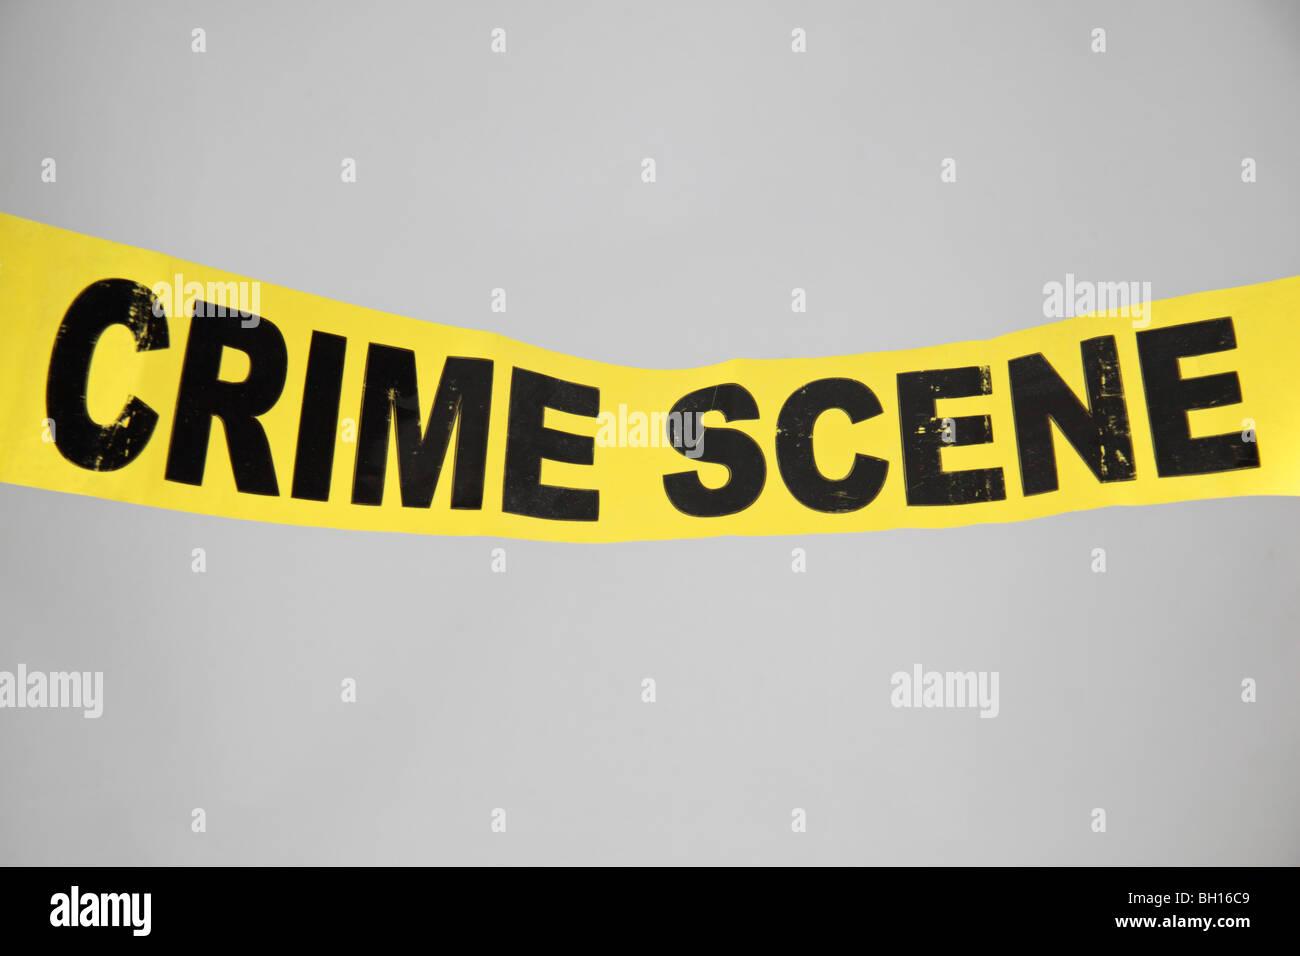 Verbrechen-Szene (nicht überqueren) Band aus dem Vereinigten Königreich (UK). Jan 2010 Stockbild